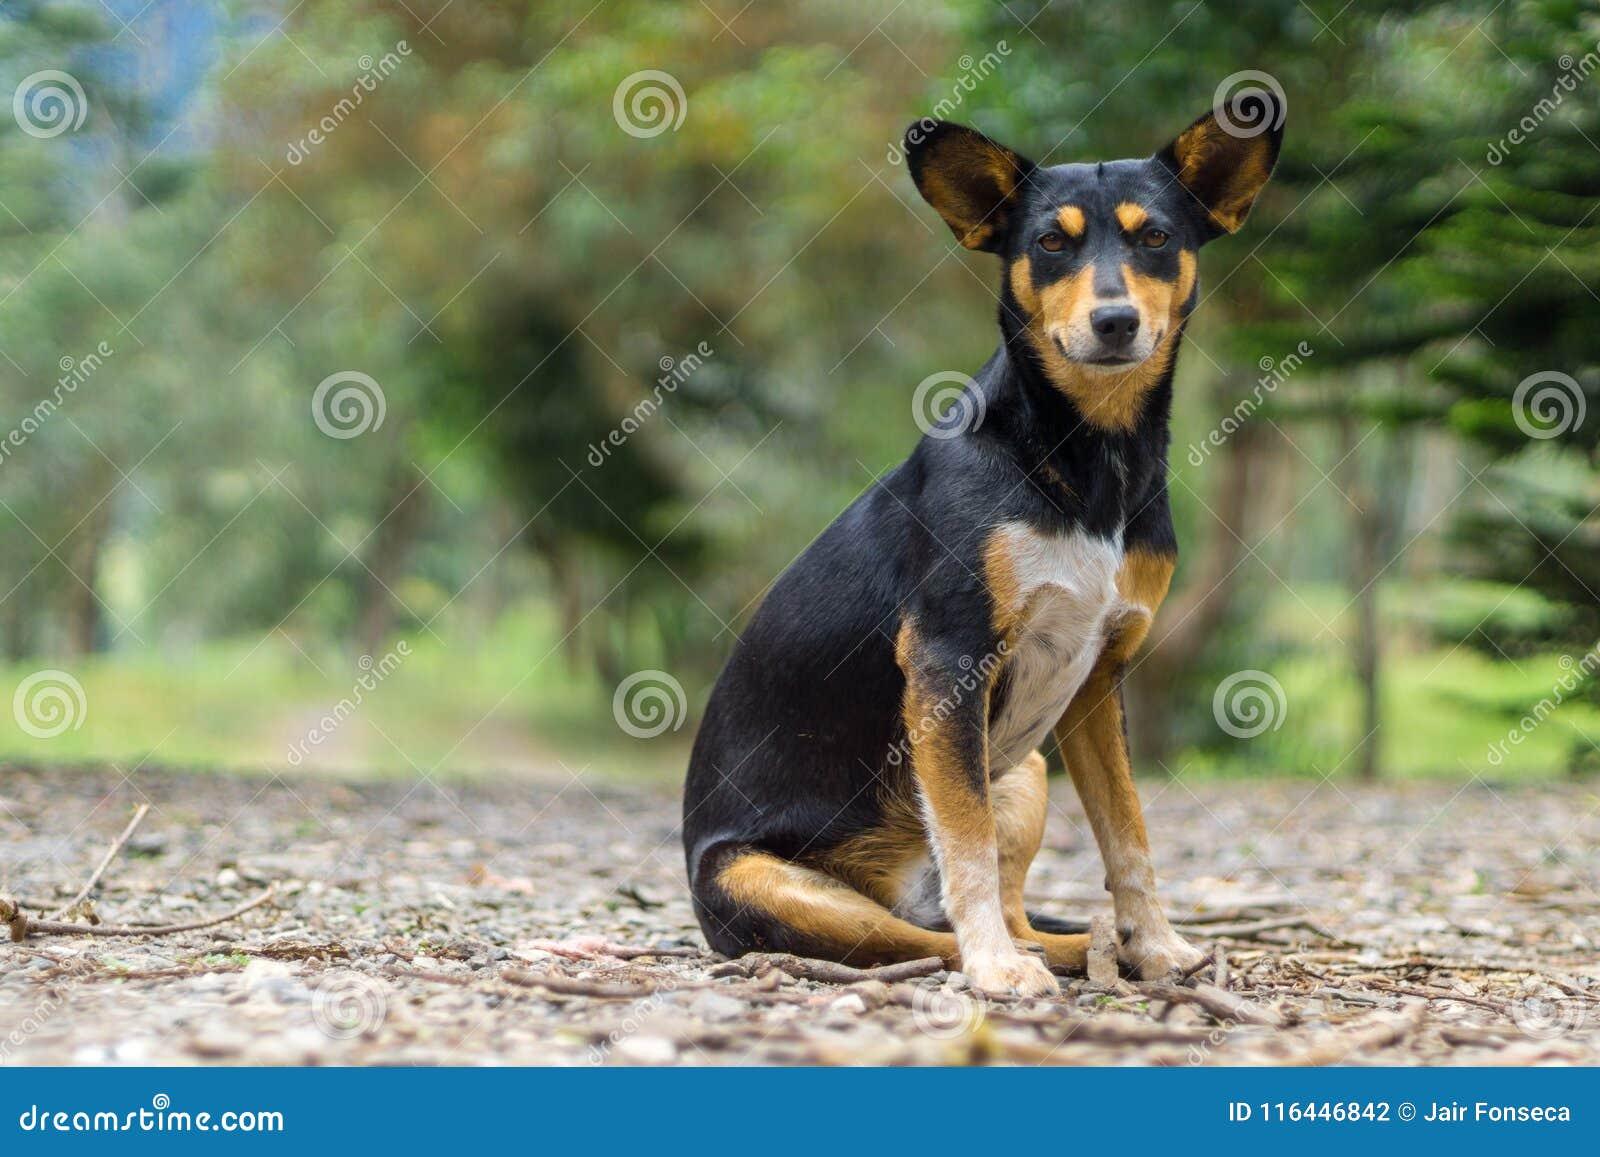 Dog with big ears sitting